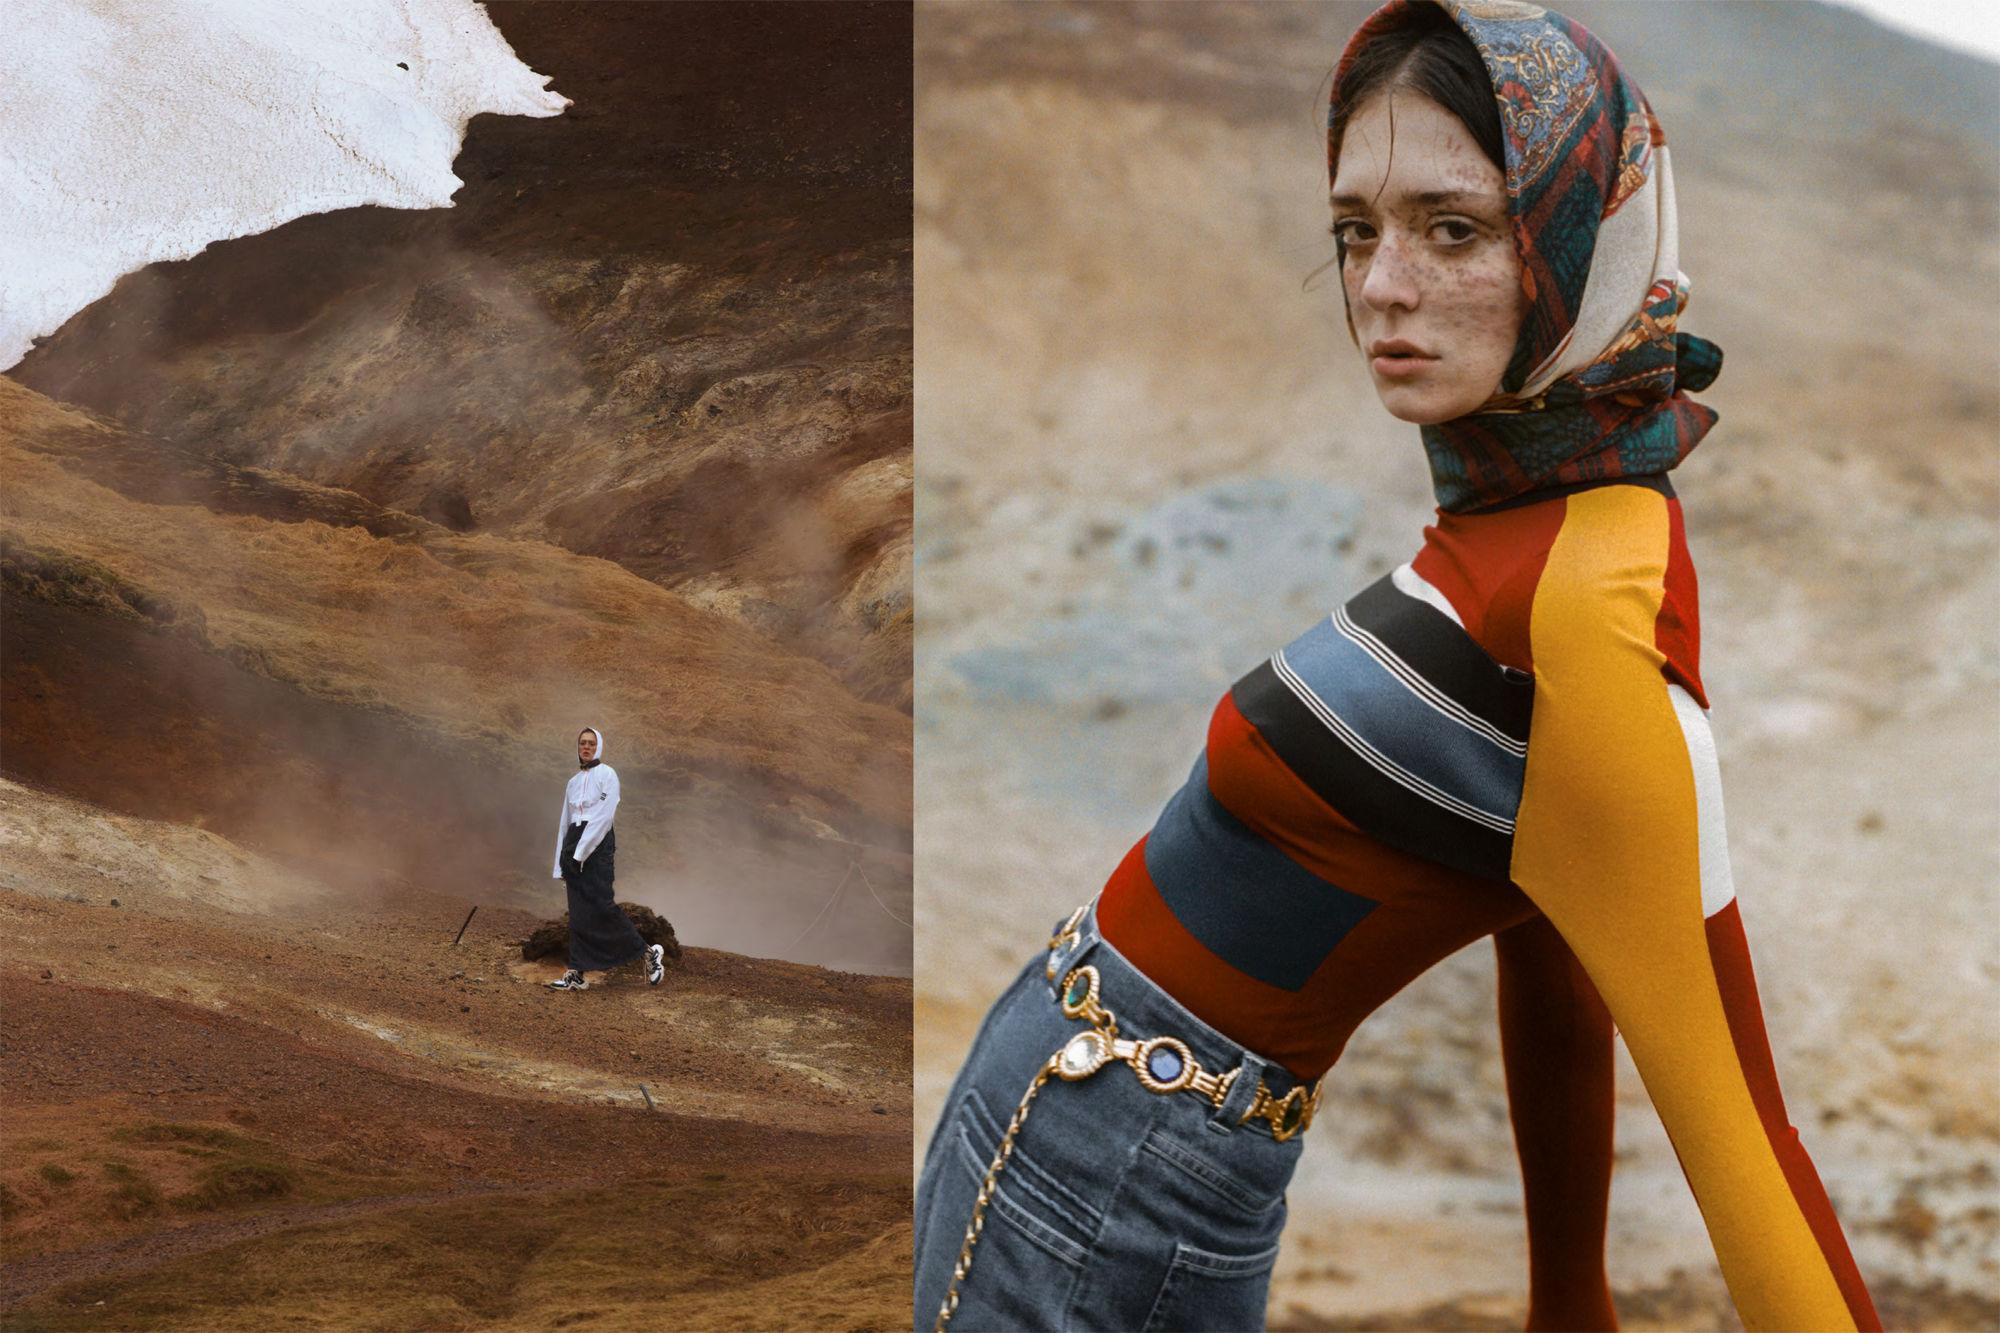 DAMIEN KRISL with MAEVA MARSHALL for SLIMI MAGAZINE on ICELAND